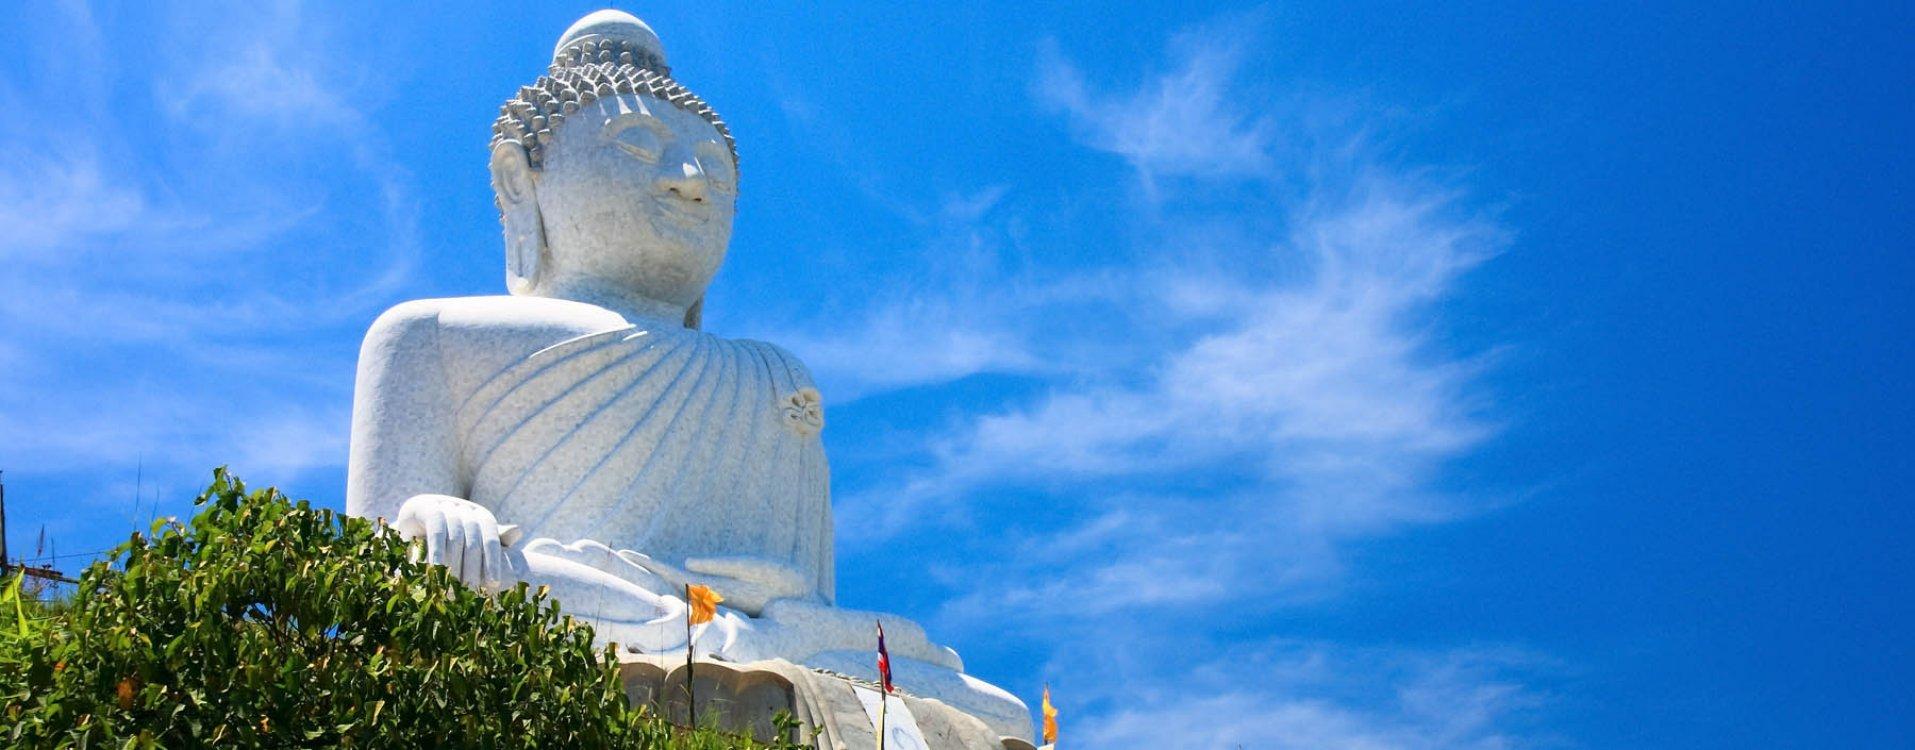 Grote Boeddha in Phuket